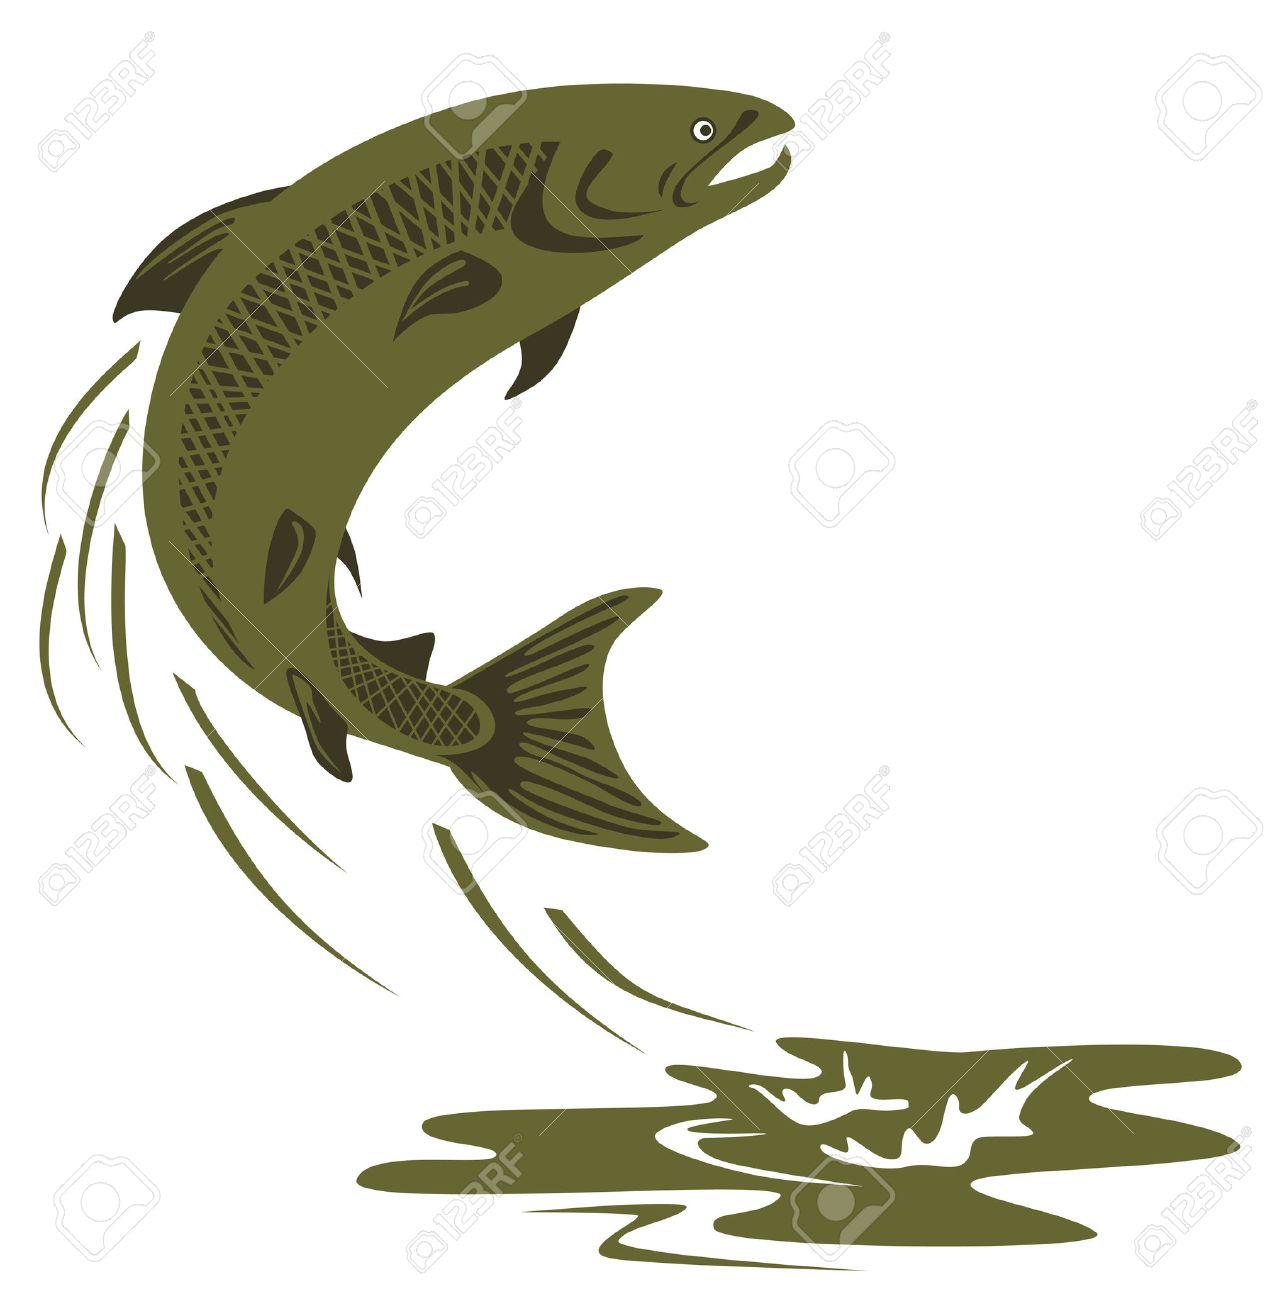 Atlantic salmon leaping.